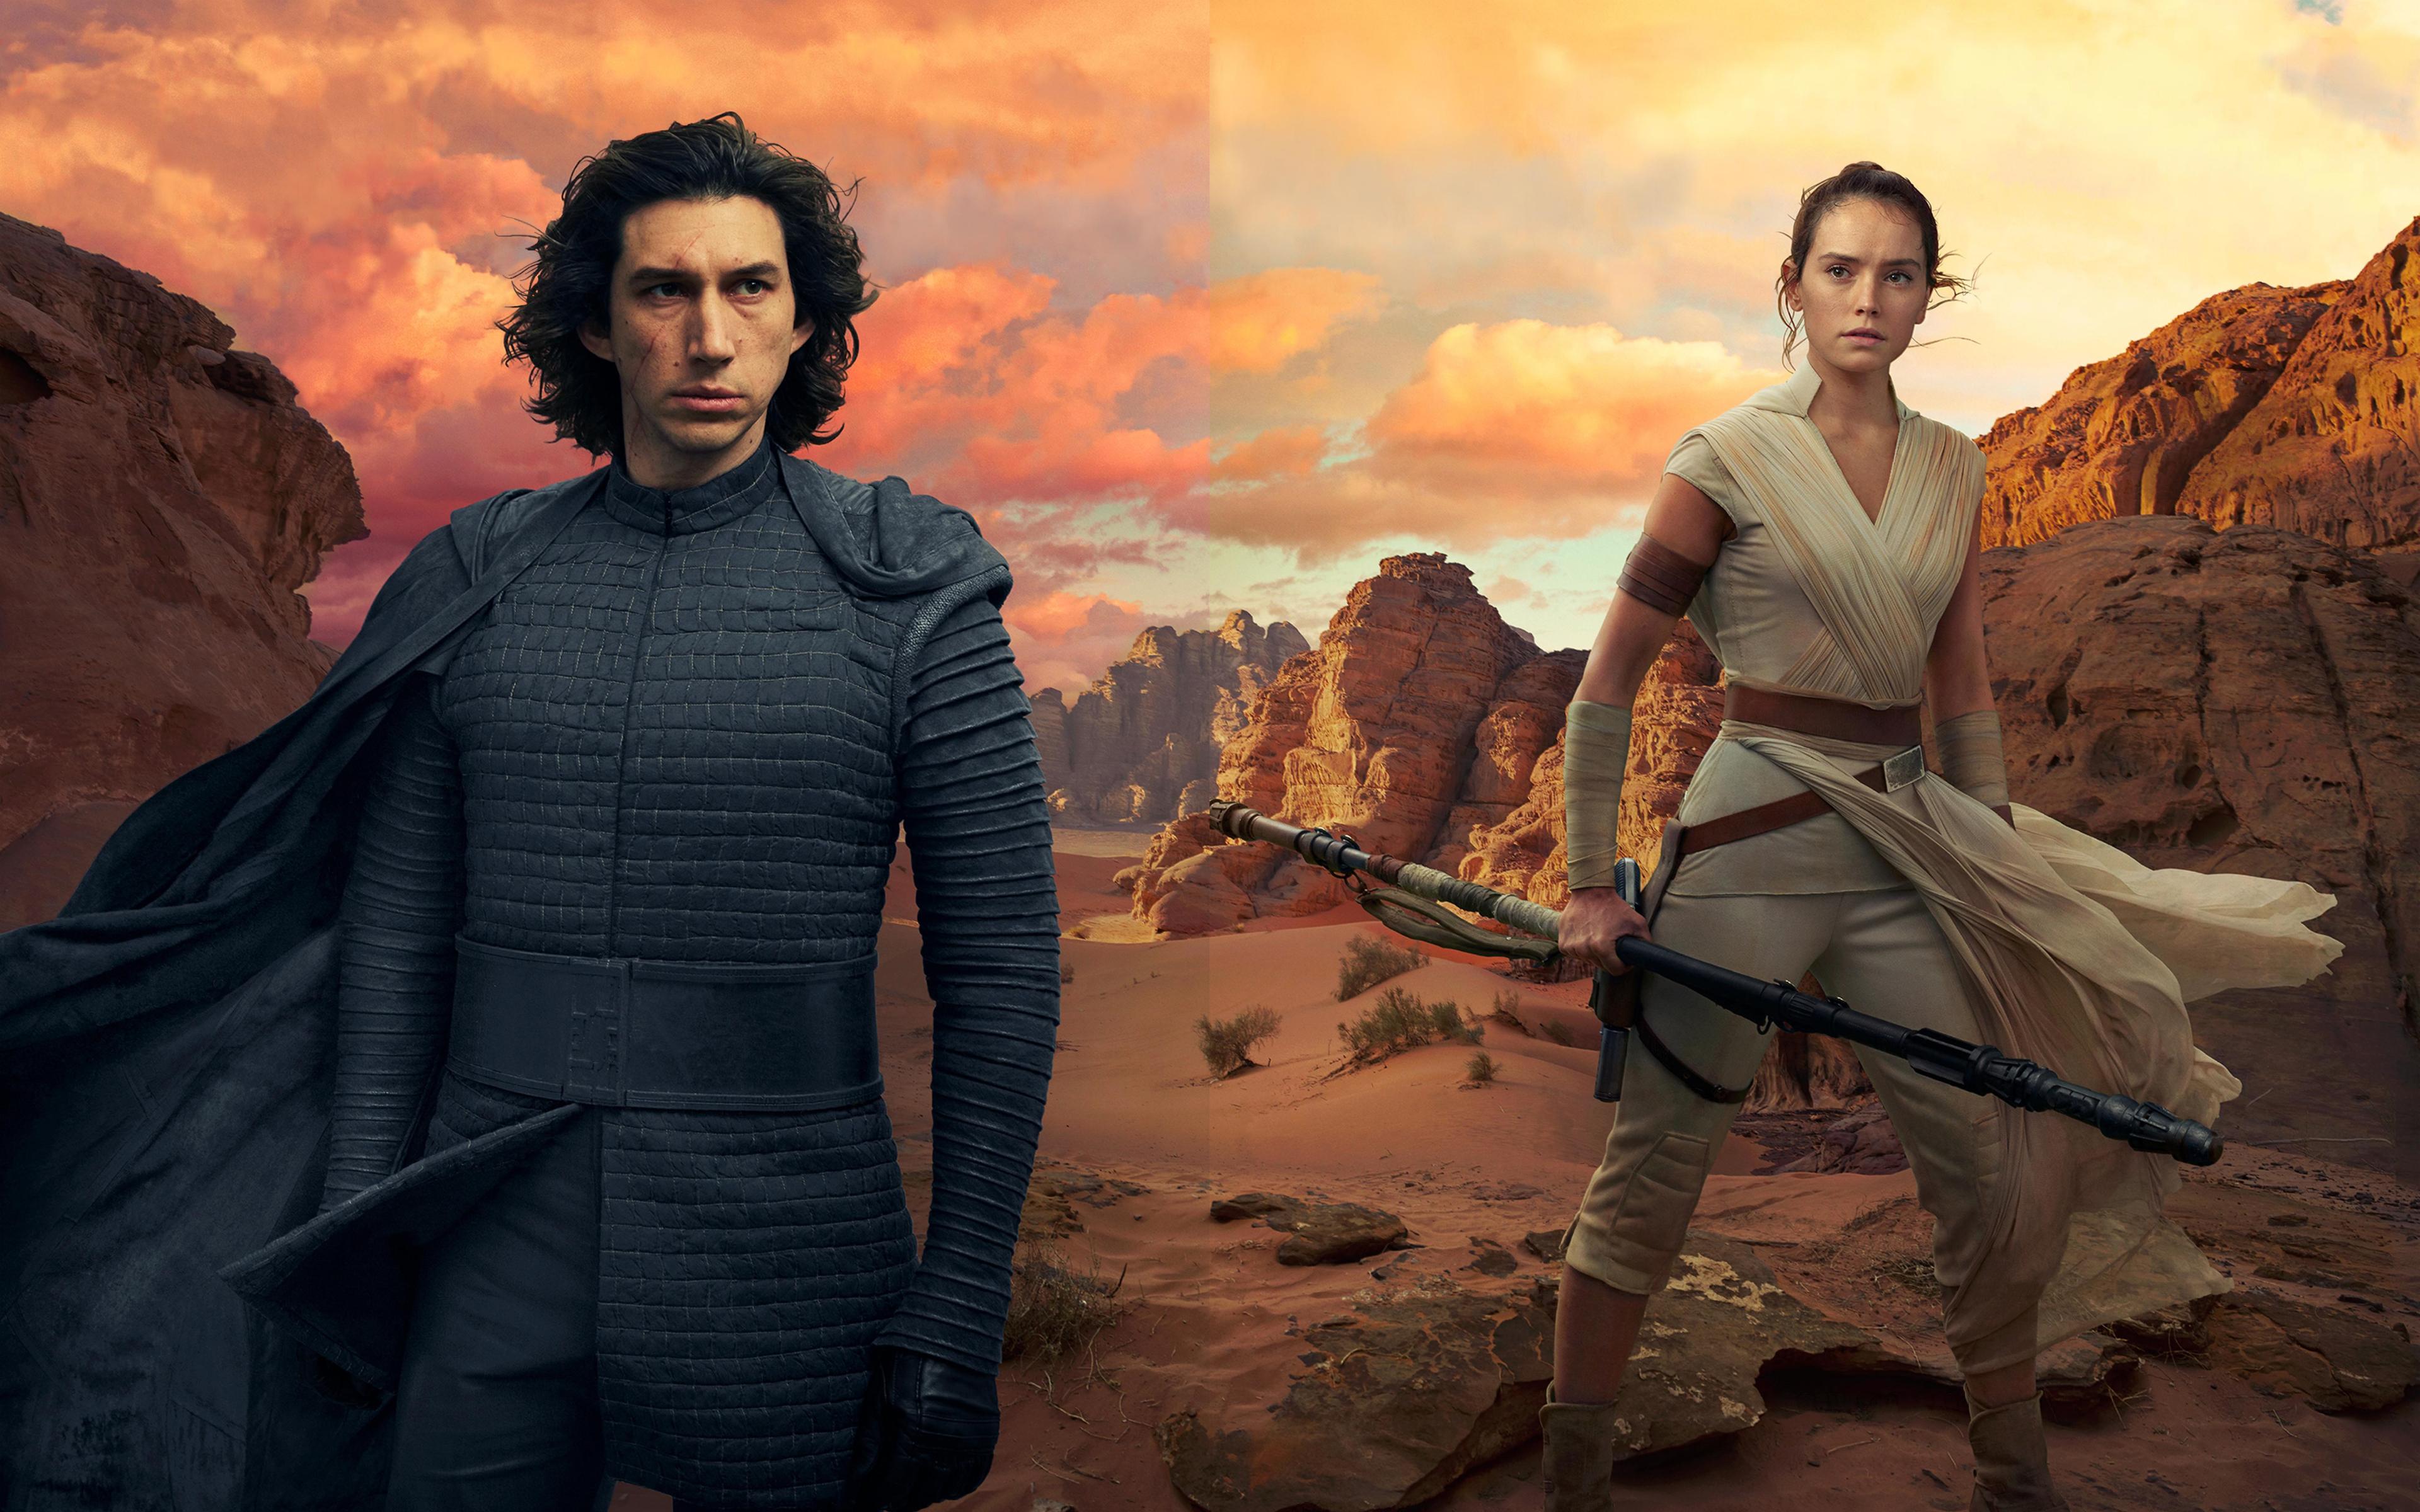 3840x2400 Kylo Ren And Rey In Star Wars The Rise Of Skywalker 4k